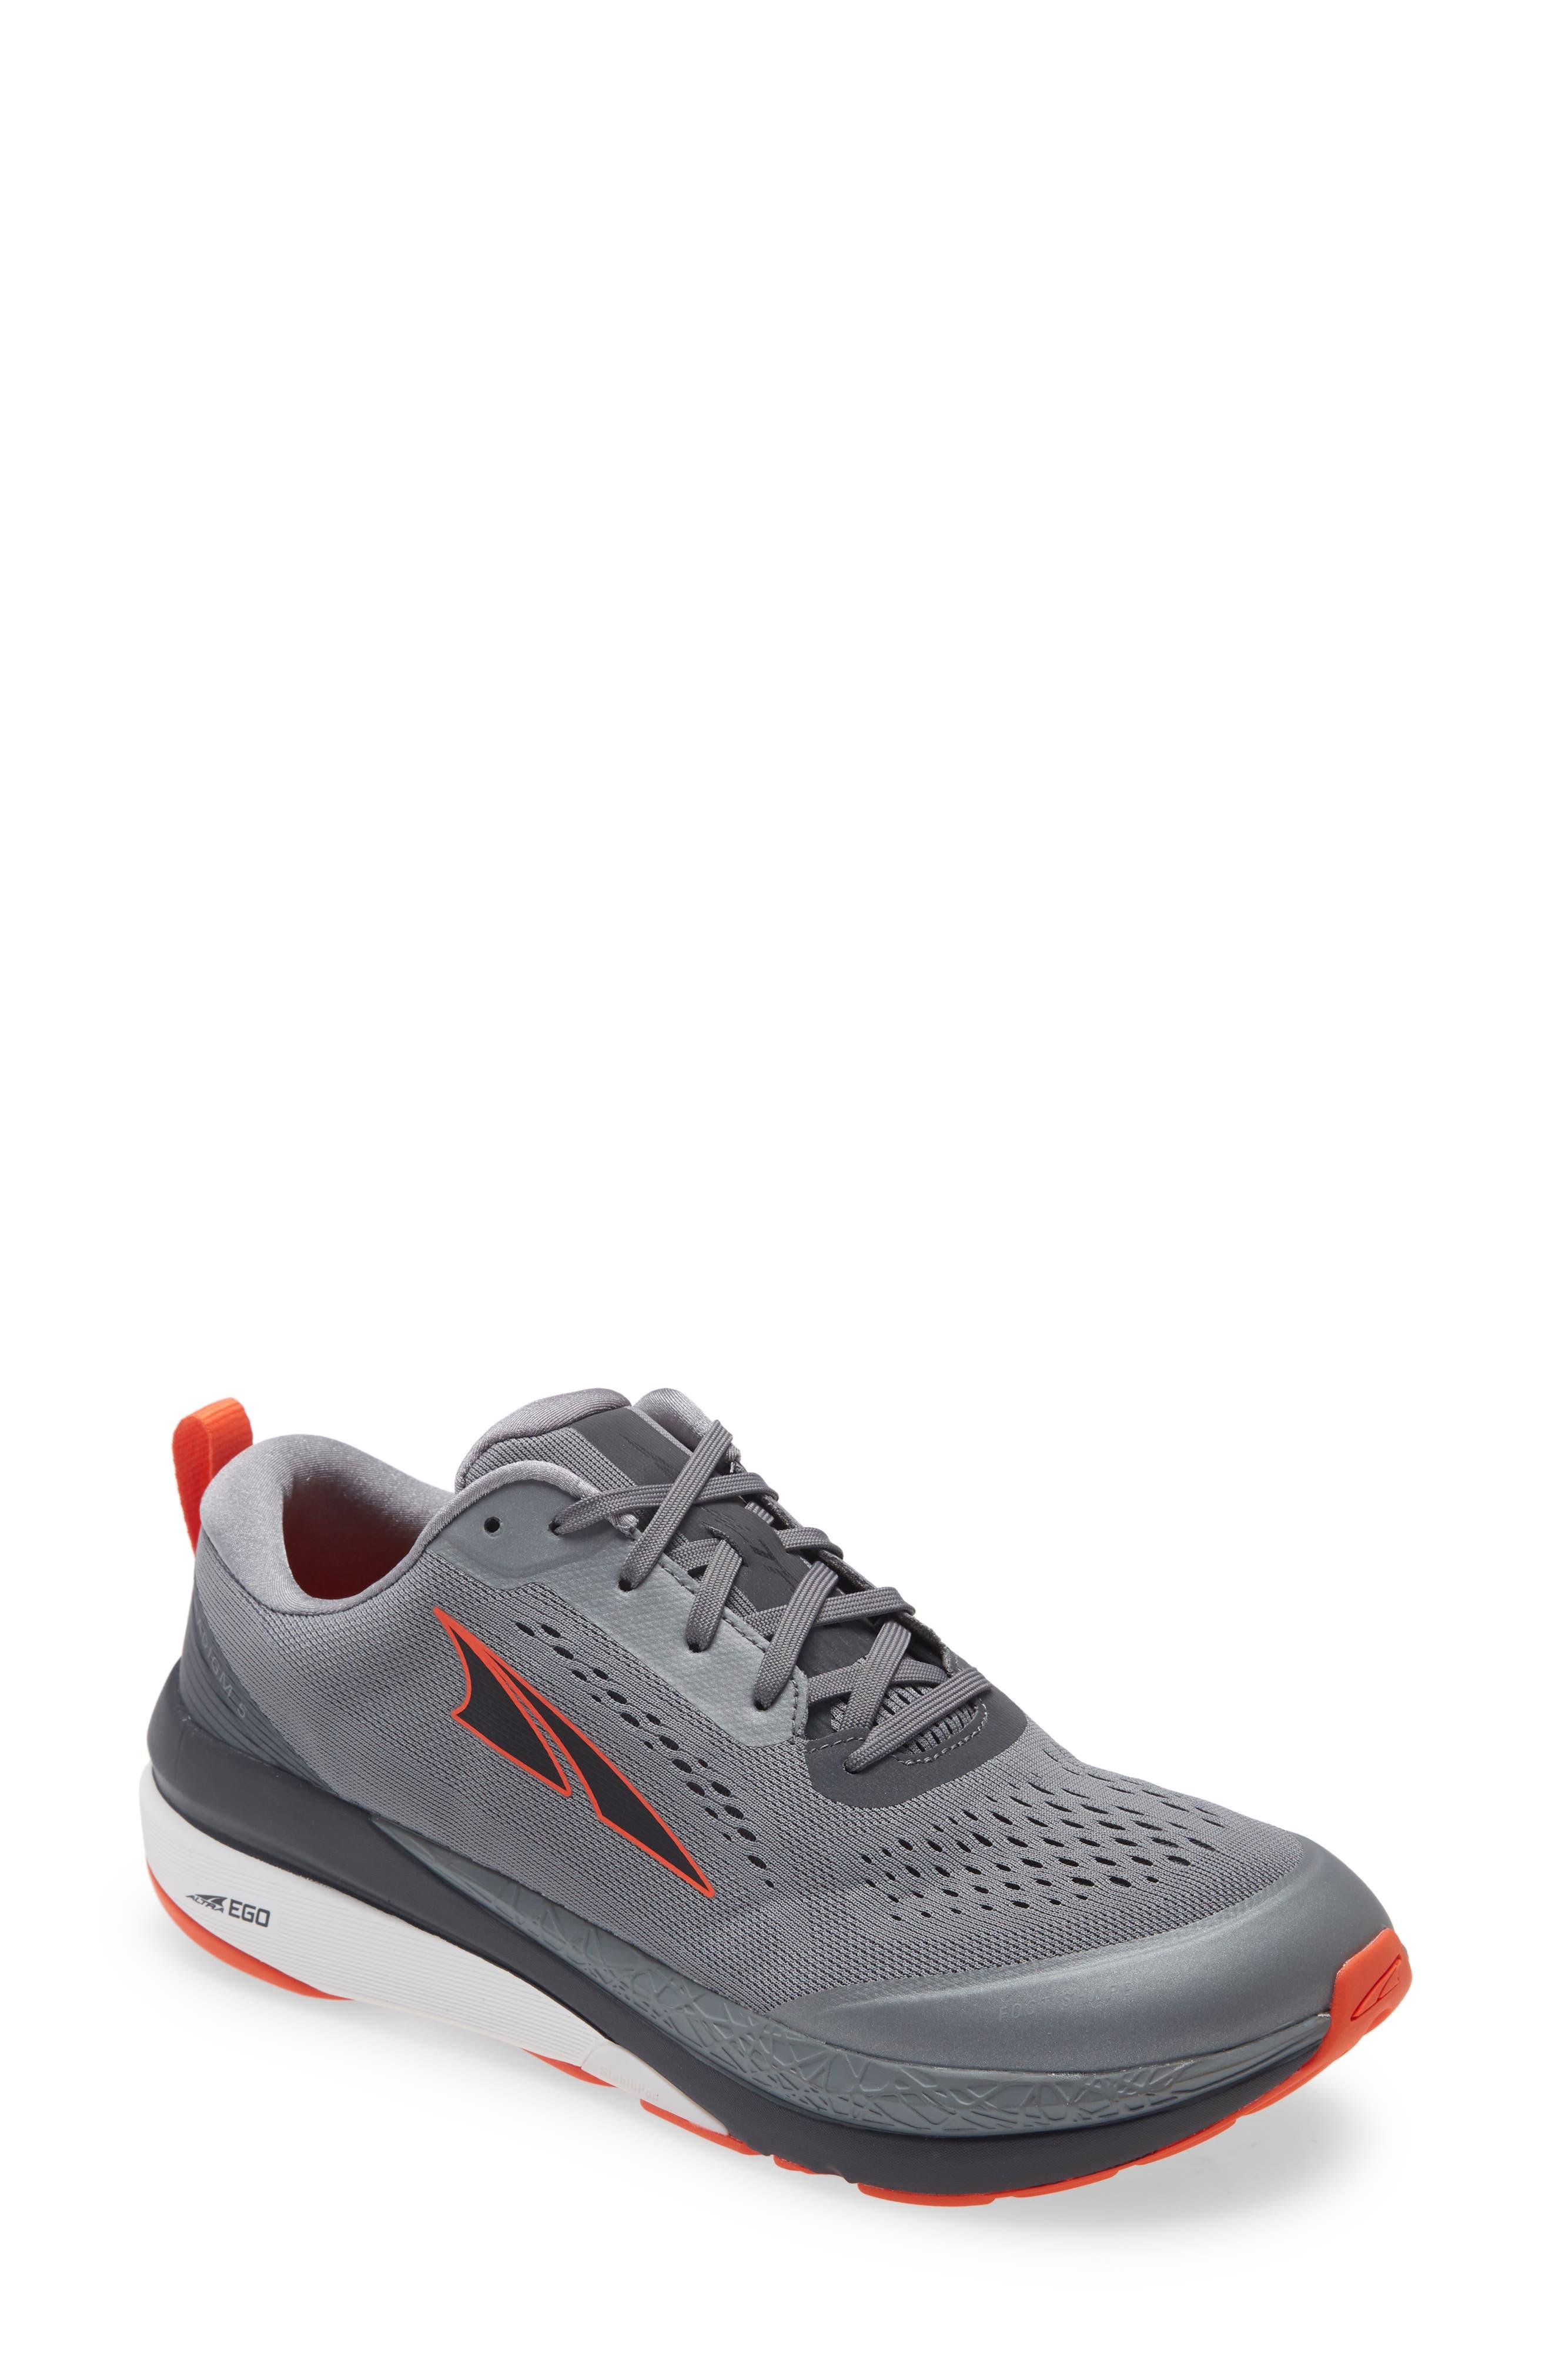 Paradigm 5 Running Shoe